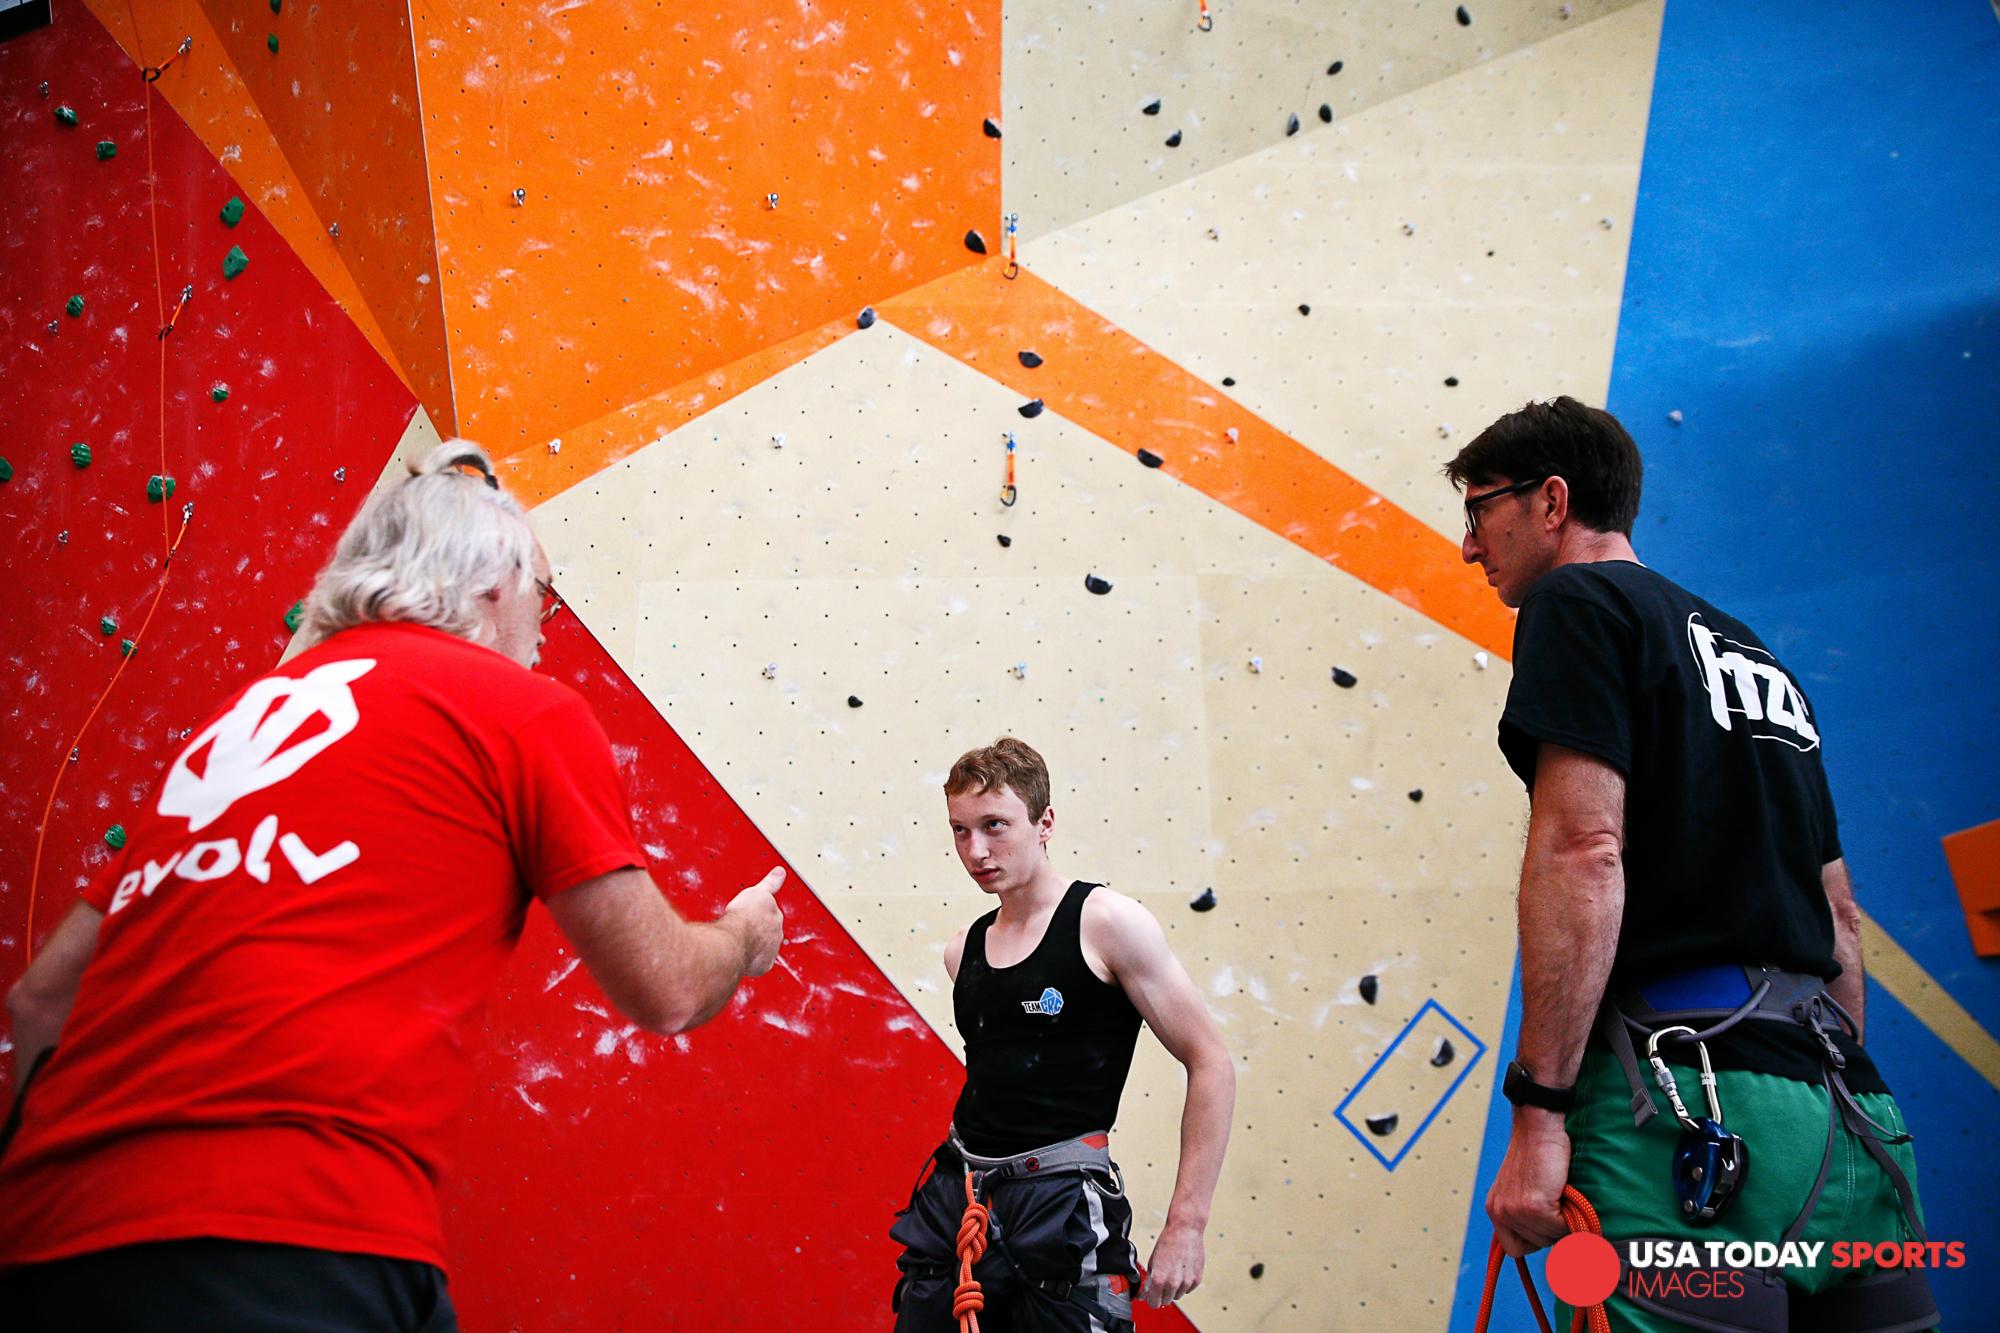 Garrett_Reid_atlanta_advertising_commercial_photographer_sport_and_speed_youth_national_chap_climbing-17.jpg